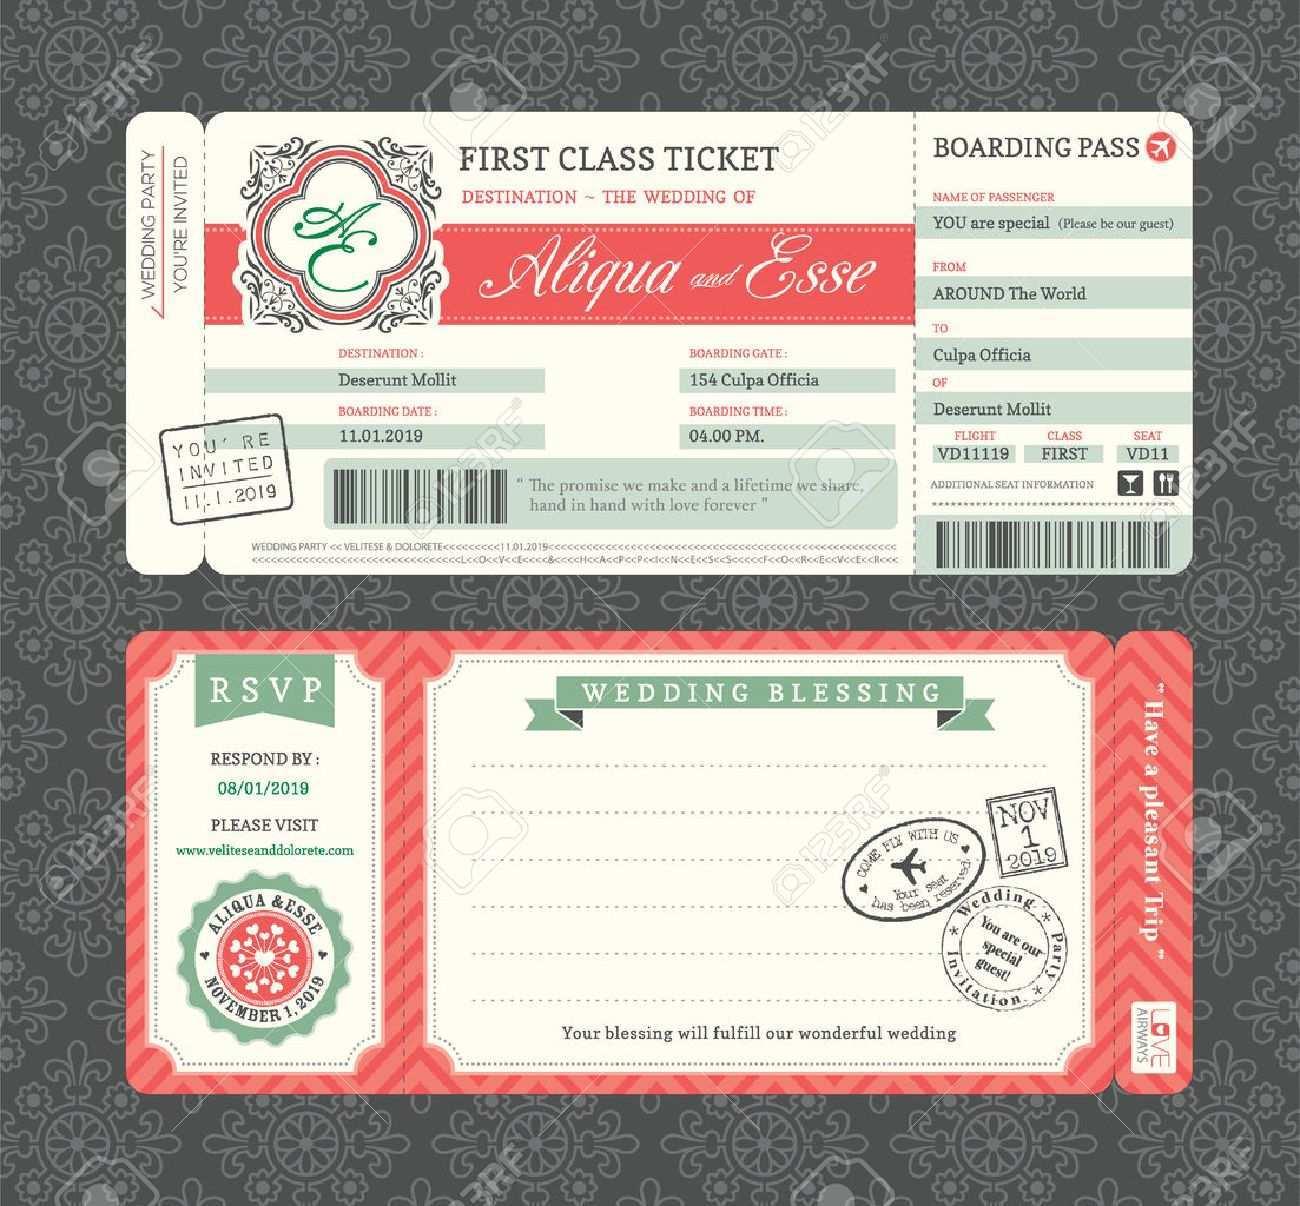 87 Free Boarding Pass Wedding Invitation Template PSD File by Boarding Pass Wedding Invitation Template